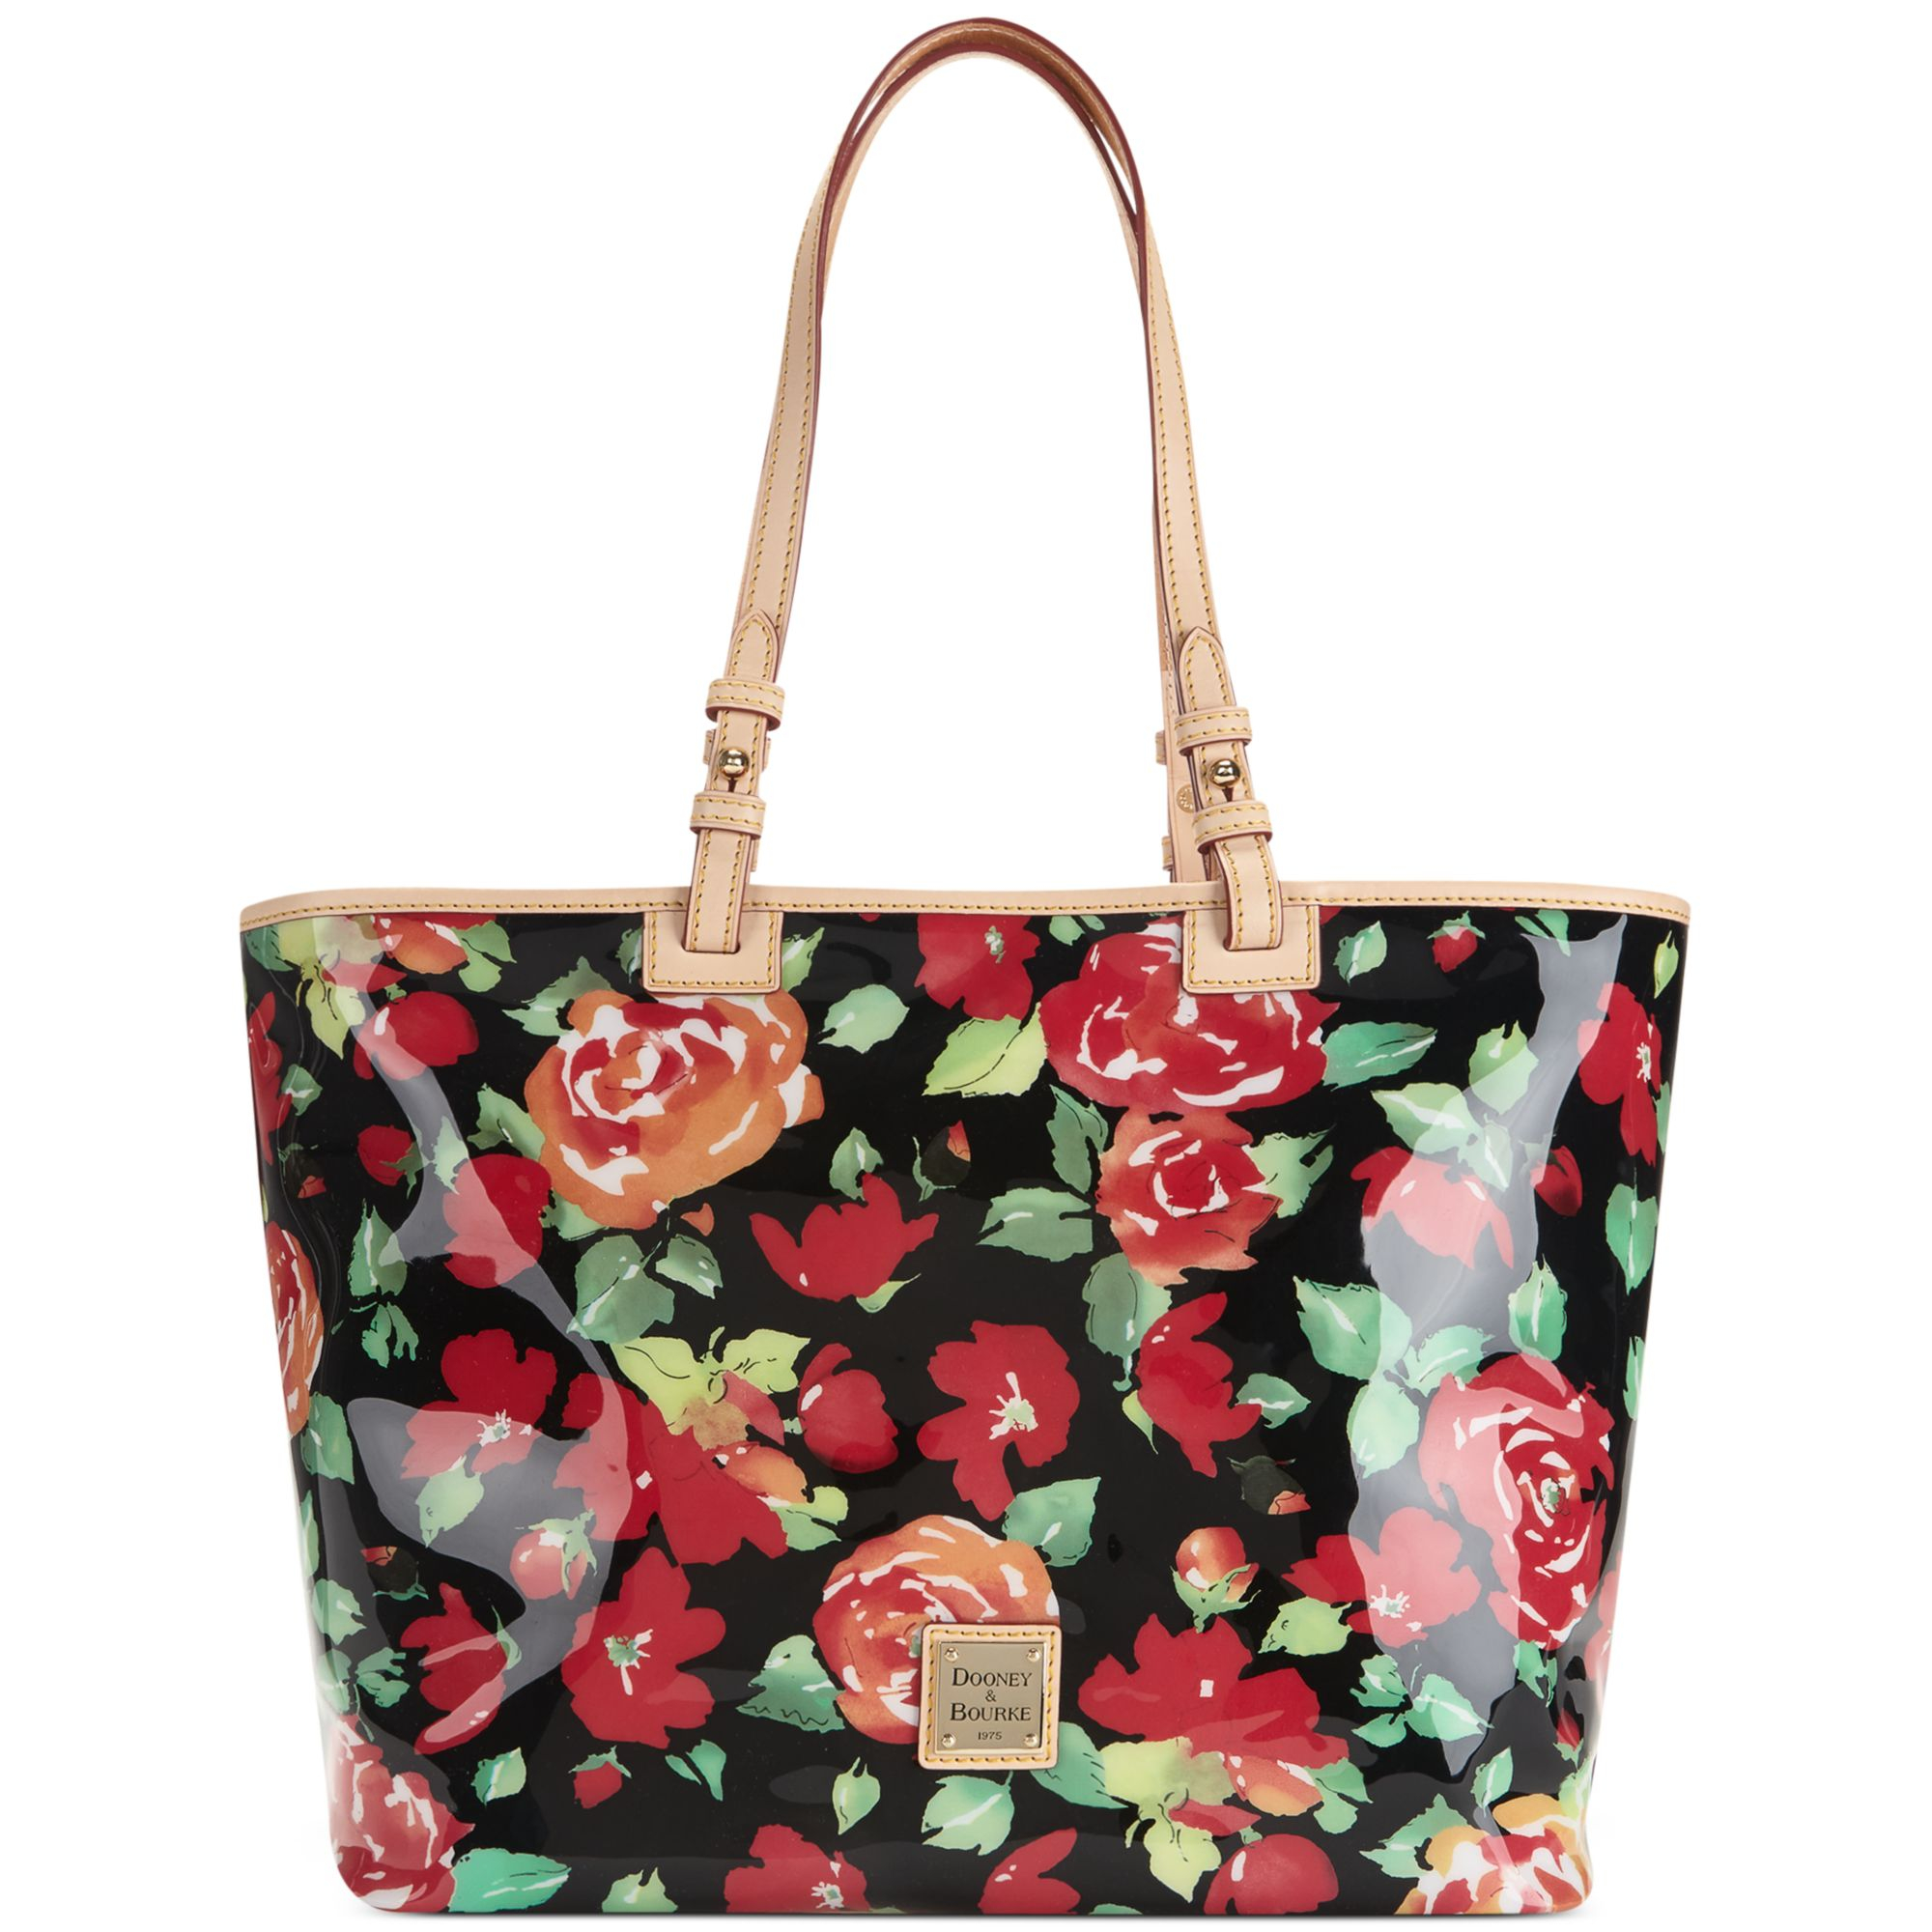 08b6a0d59a Lyst - Dooney   Bourke Floral Leisure Shopper in Black